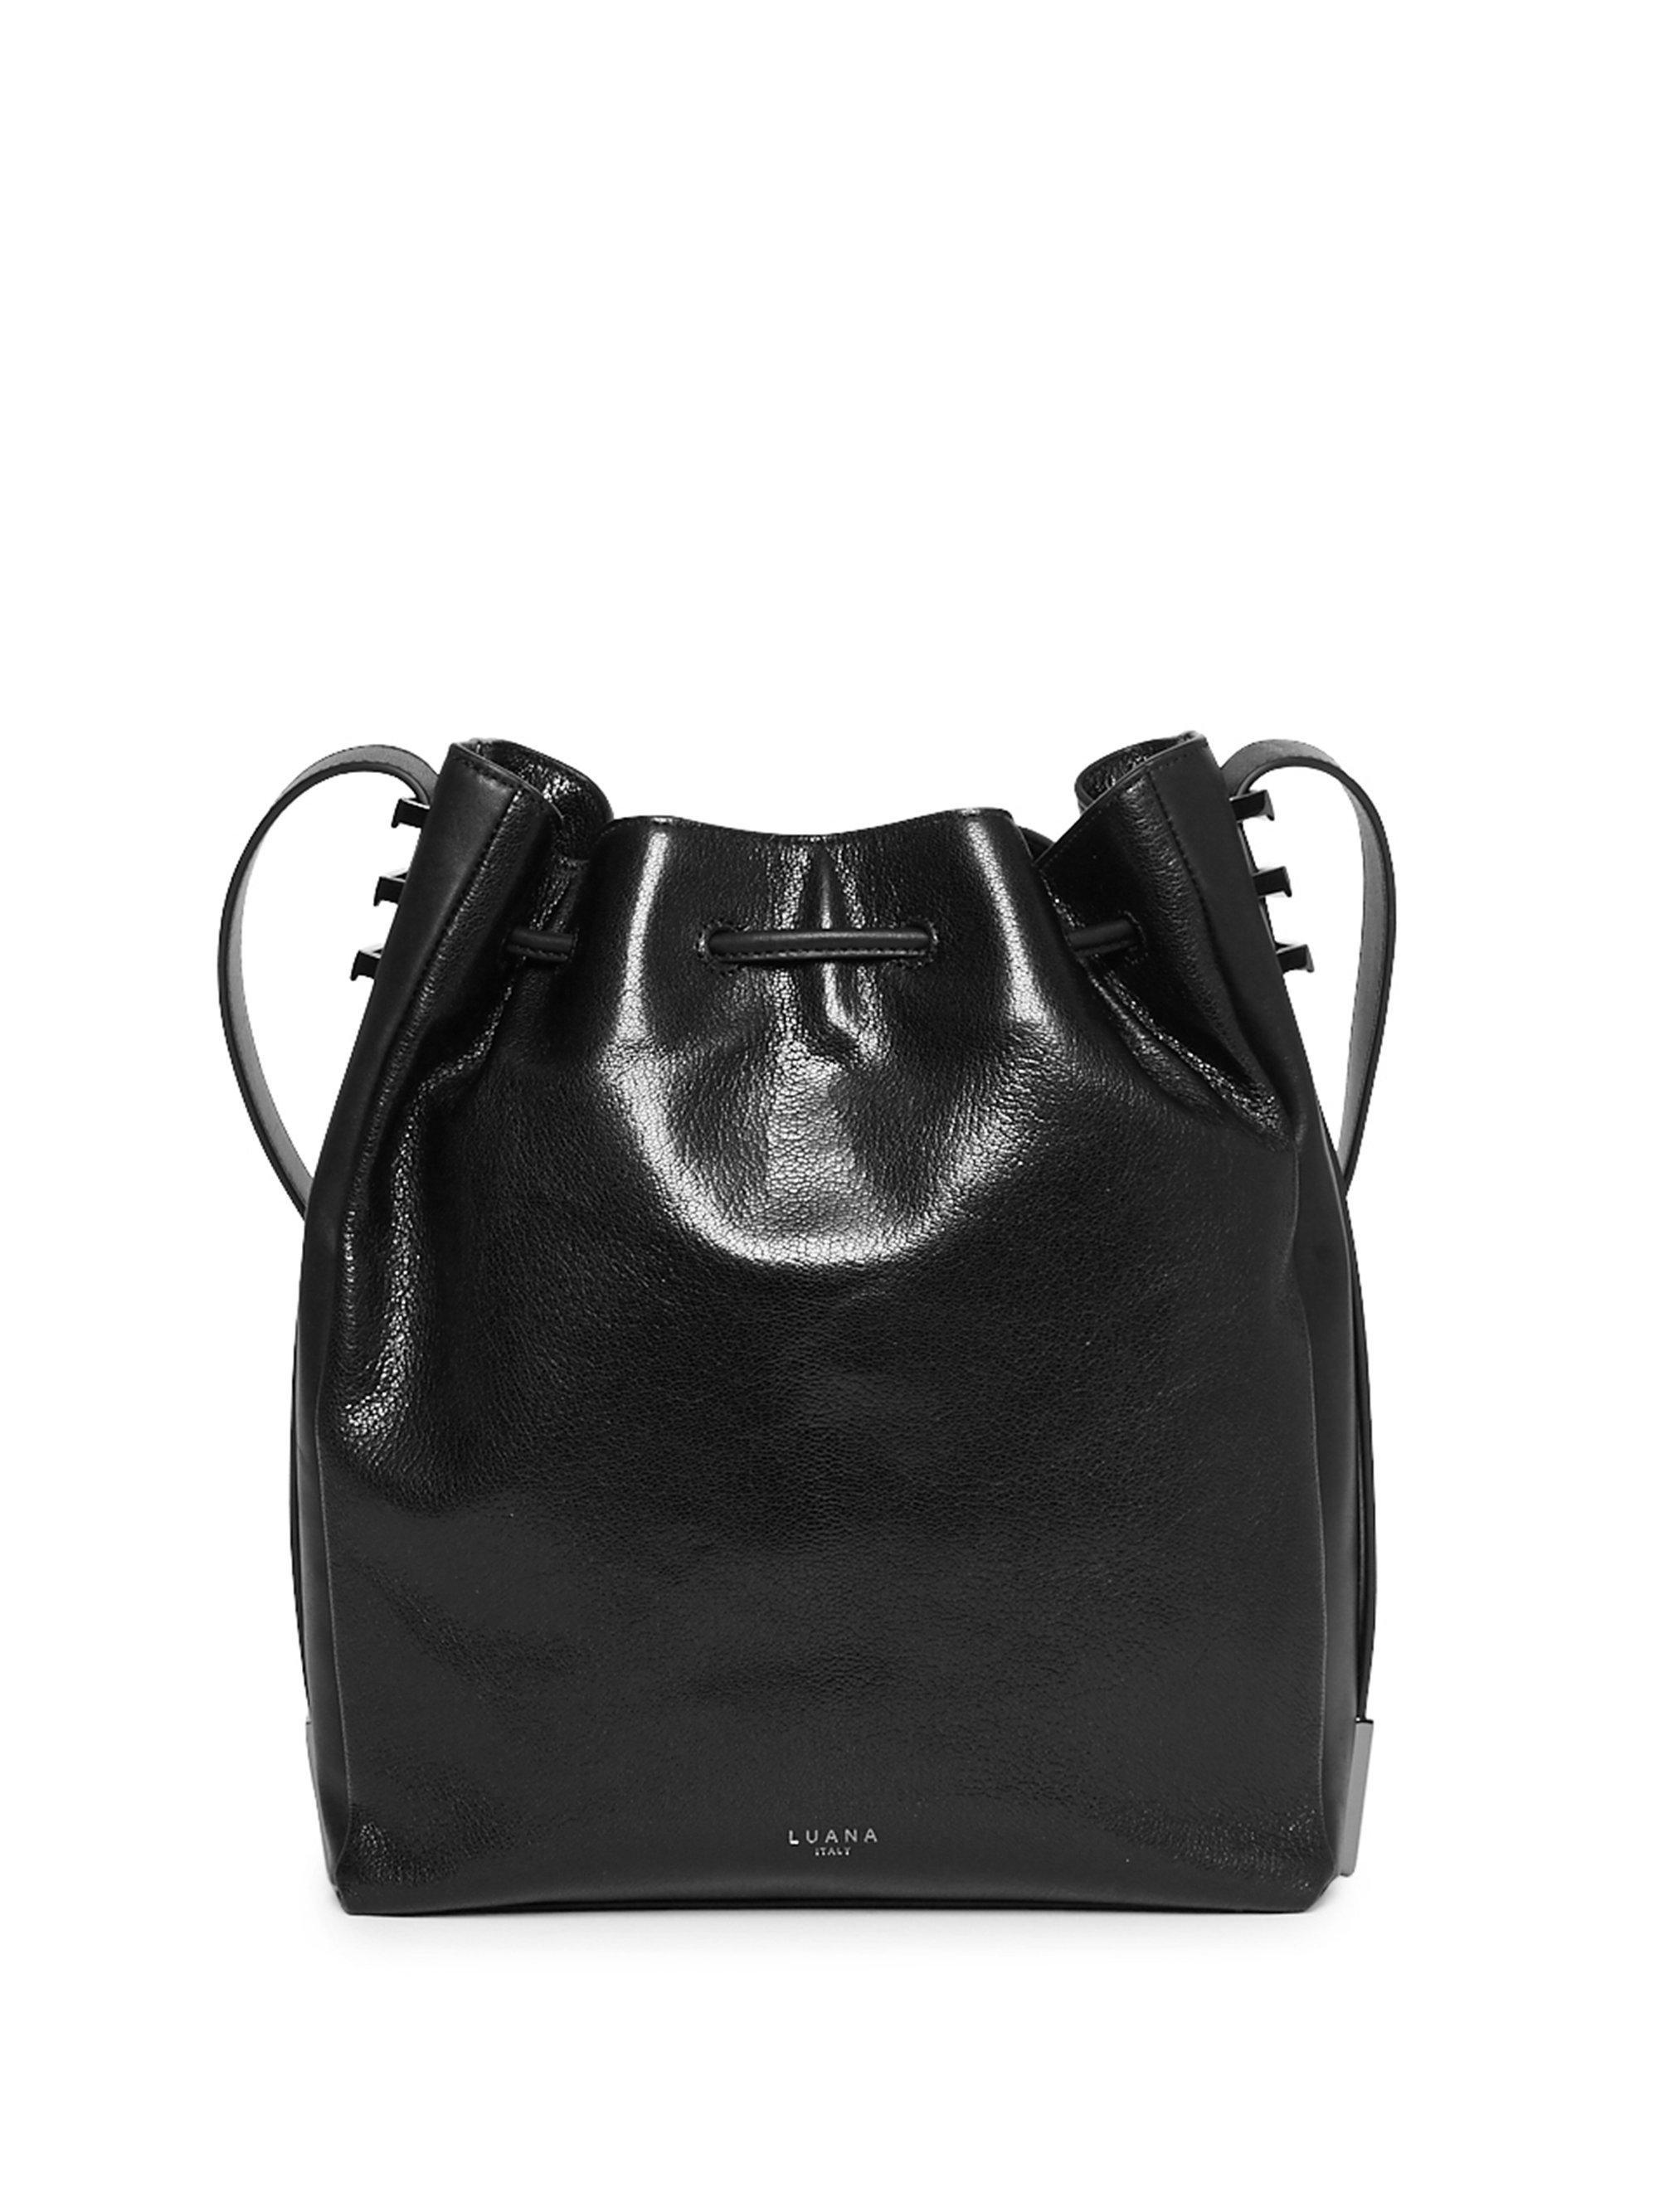 Pre-owned - Leather shoulder bag Luana Italy e7slXuB